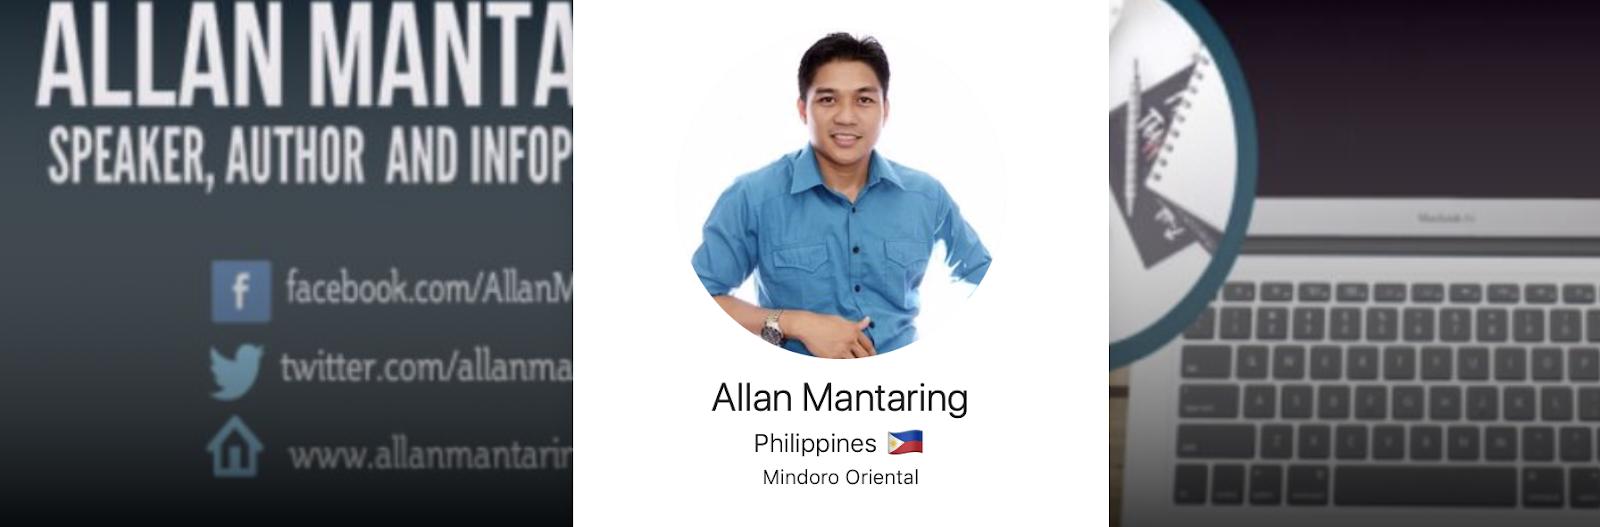 Allan Mantaring   Afluencer Profile   Stock Market Influencers Featured on Afluencer